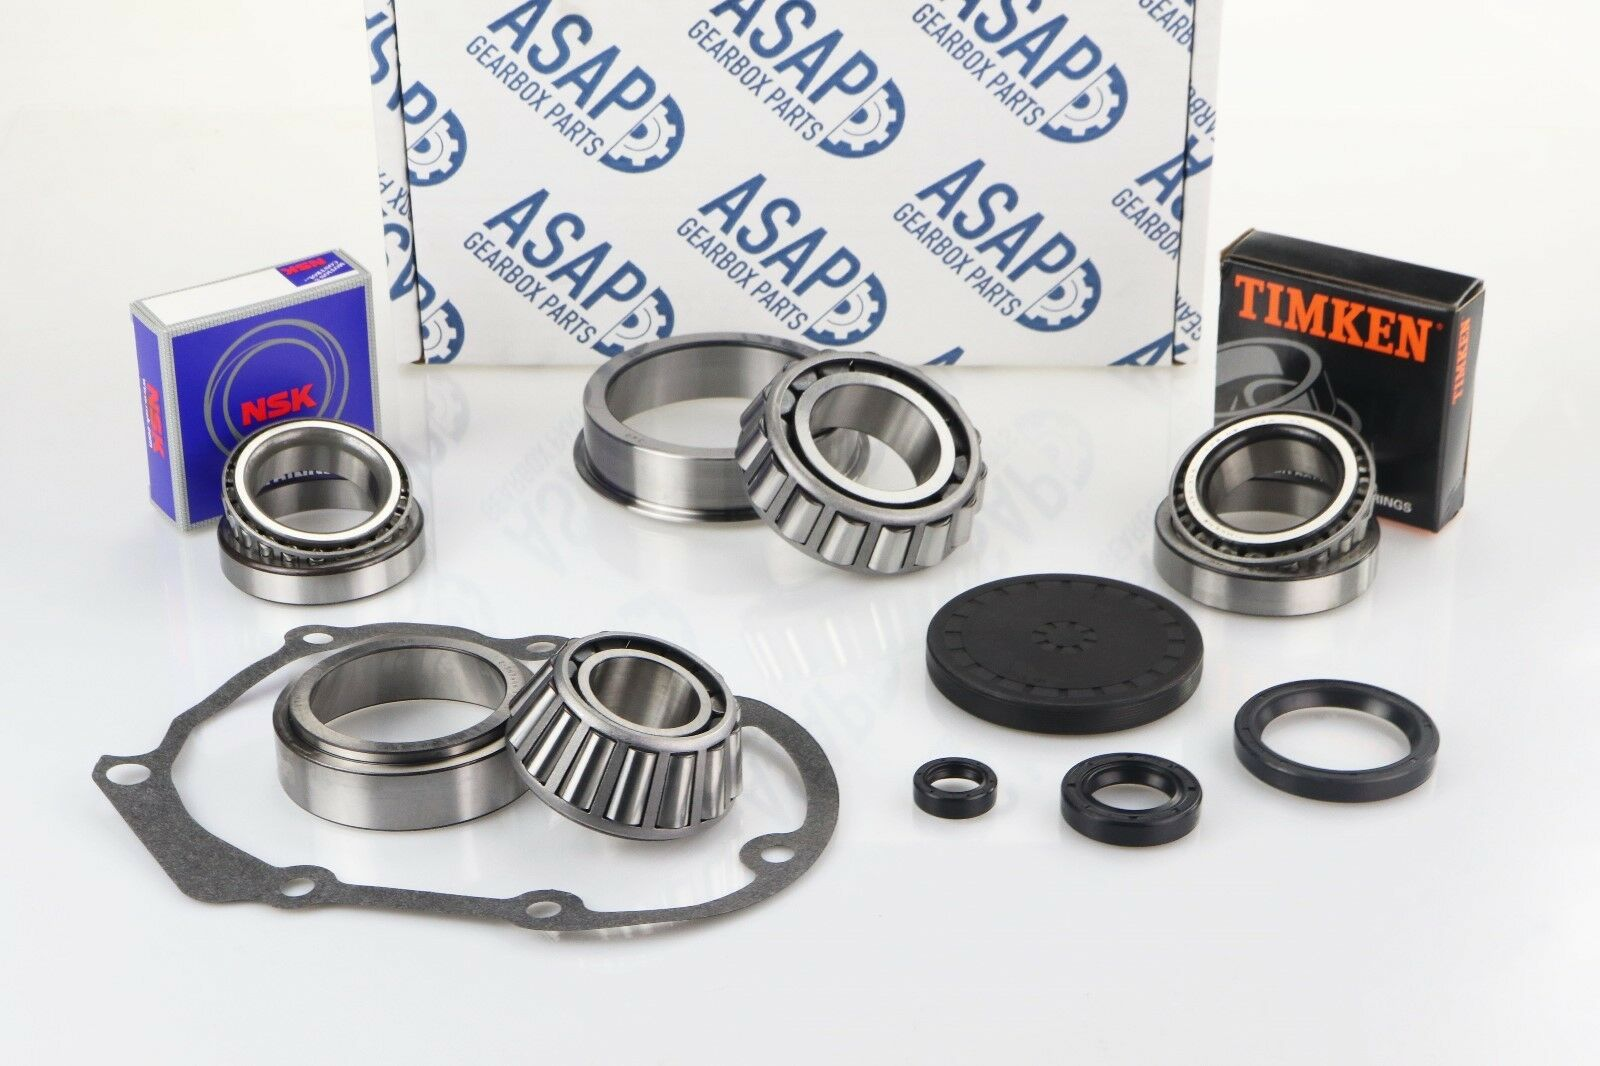 Details about VW Passat 6 Speed 01E Gearbox OEM Bearing & Oil Seal Rebuild  Kit 2000 - 2004